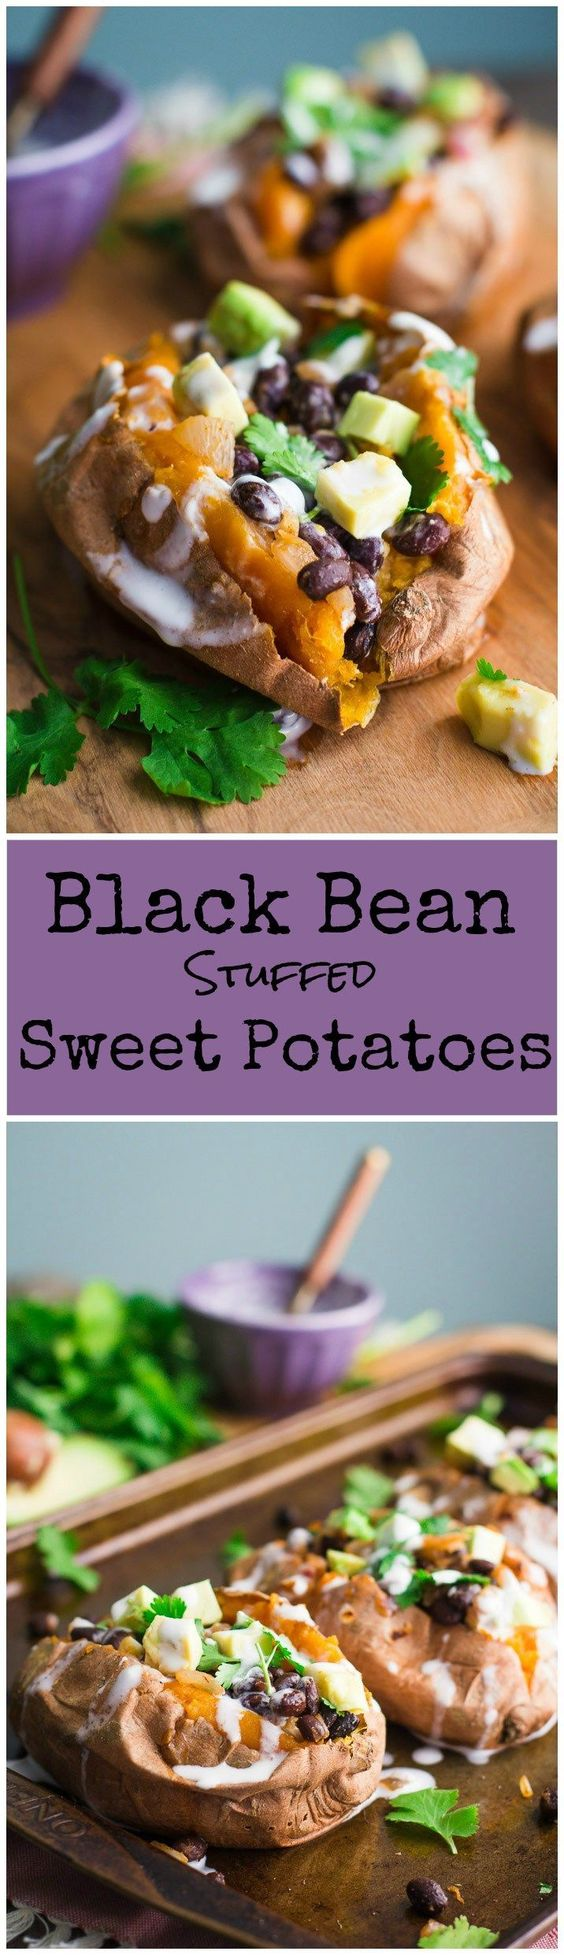 Black beans, Stuffed sweet potatoes and Beans on Pinterest